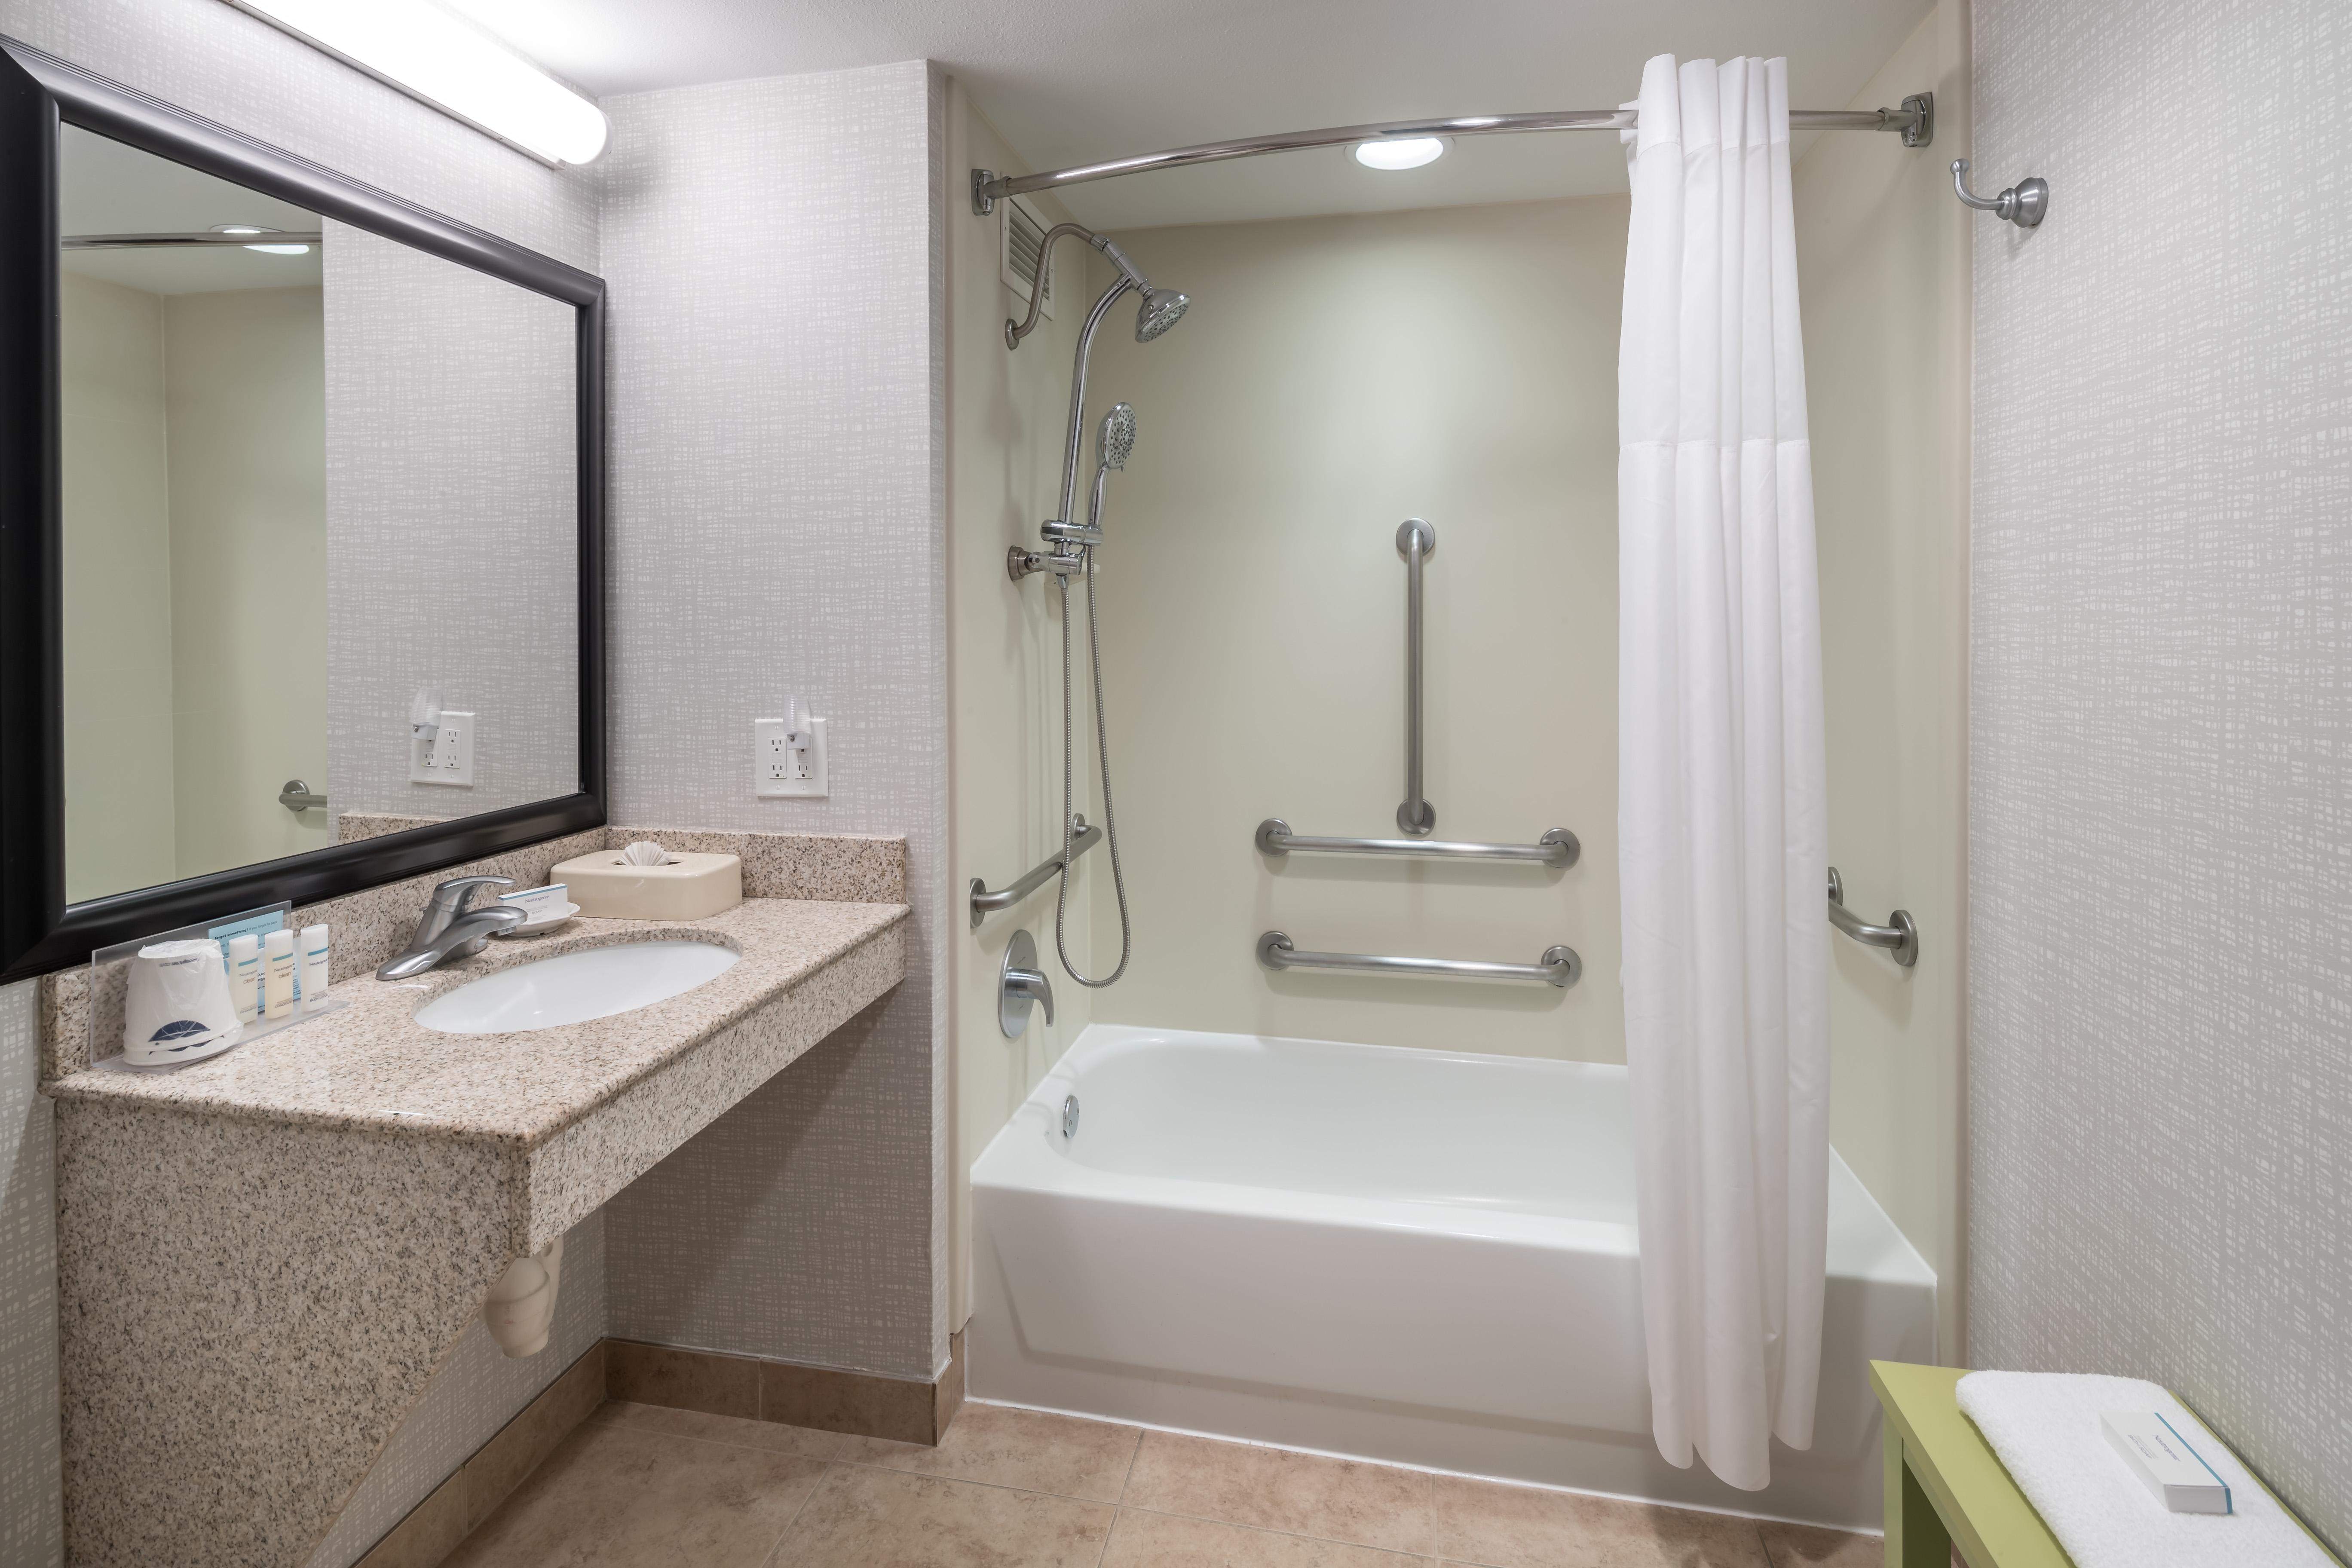 https://www.hotelsbyday.com/_data/default-hotel_image/4/23598/ahr-4274-chiskhx-448-nkjud.jpg